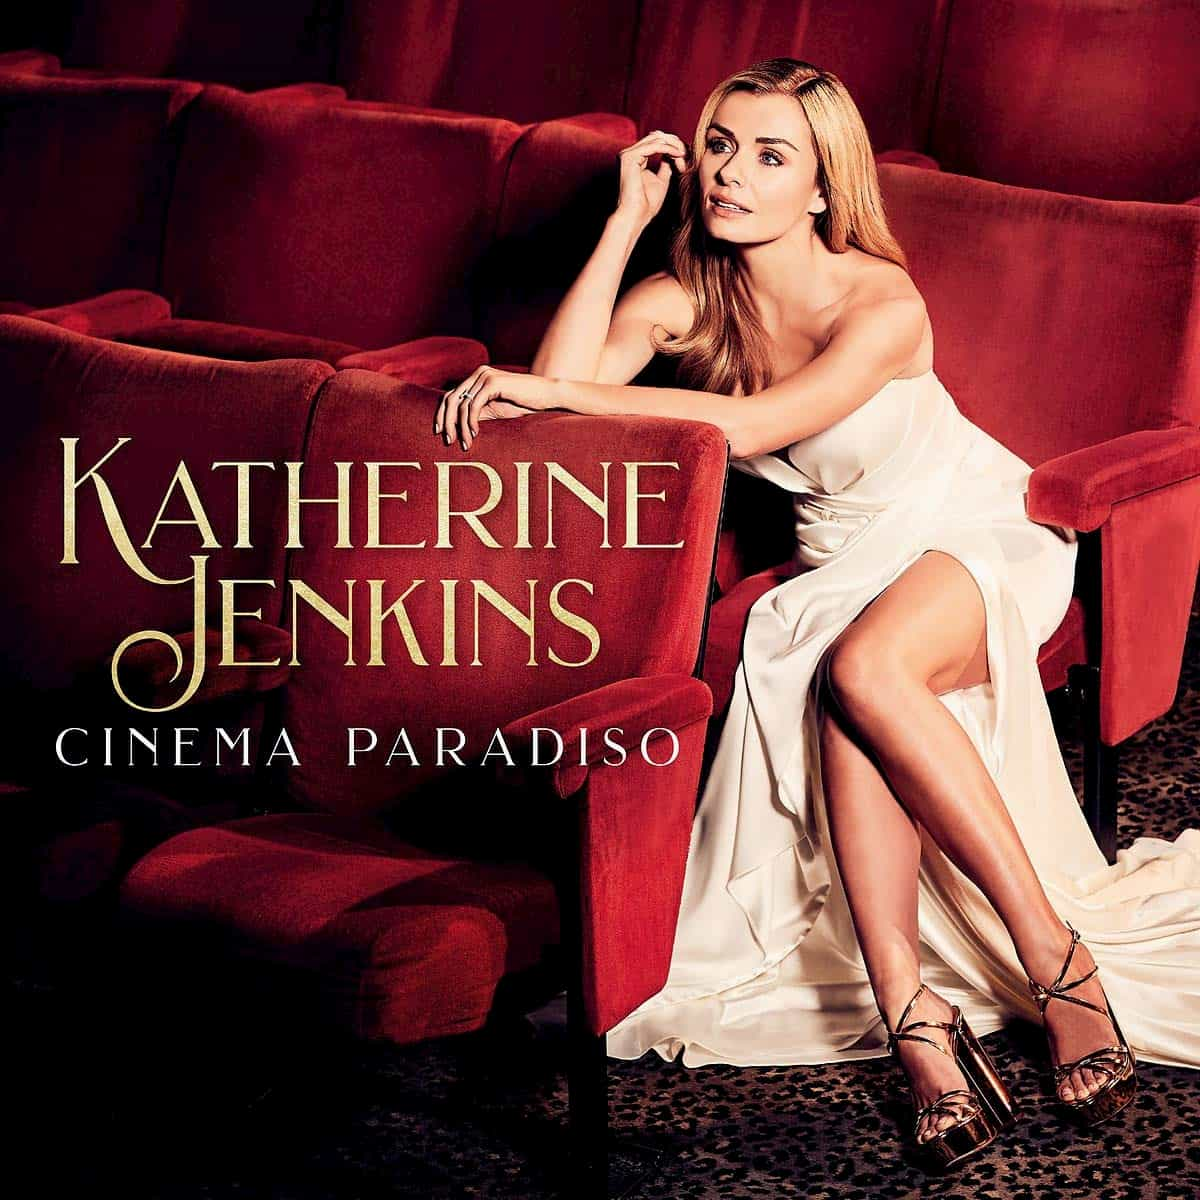 Katherine Jenkins - Neue Klassik-CD Cinema Paradiso mit bekannten Film-Melodien